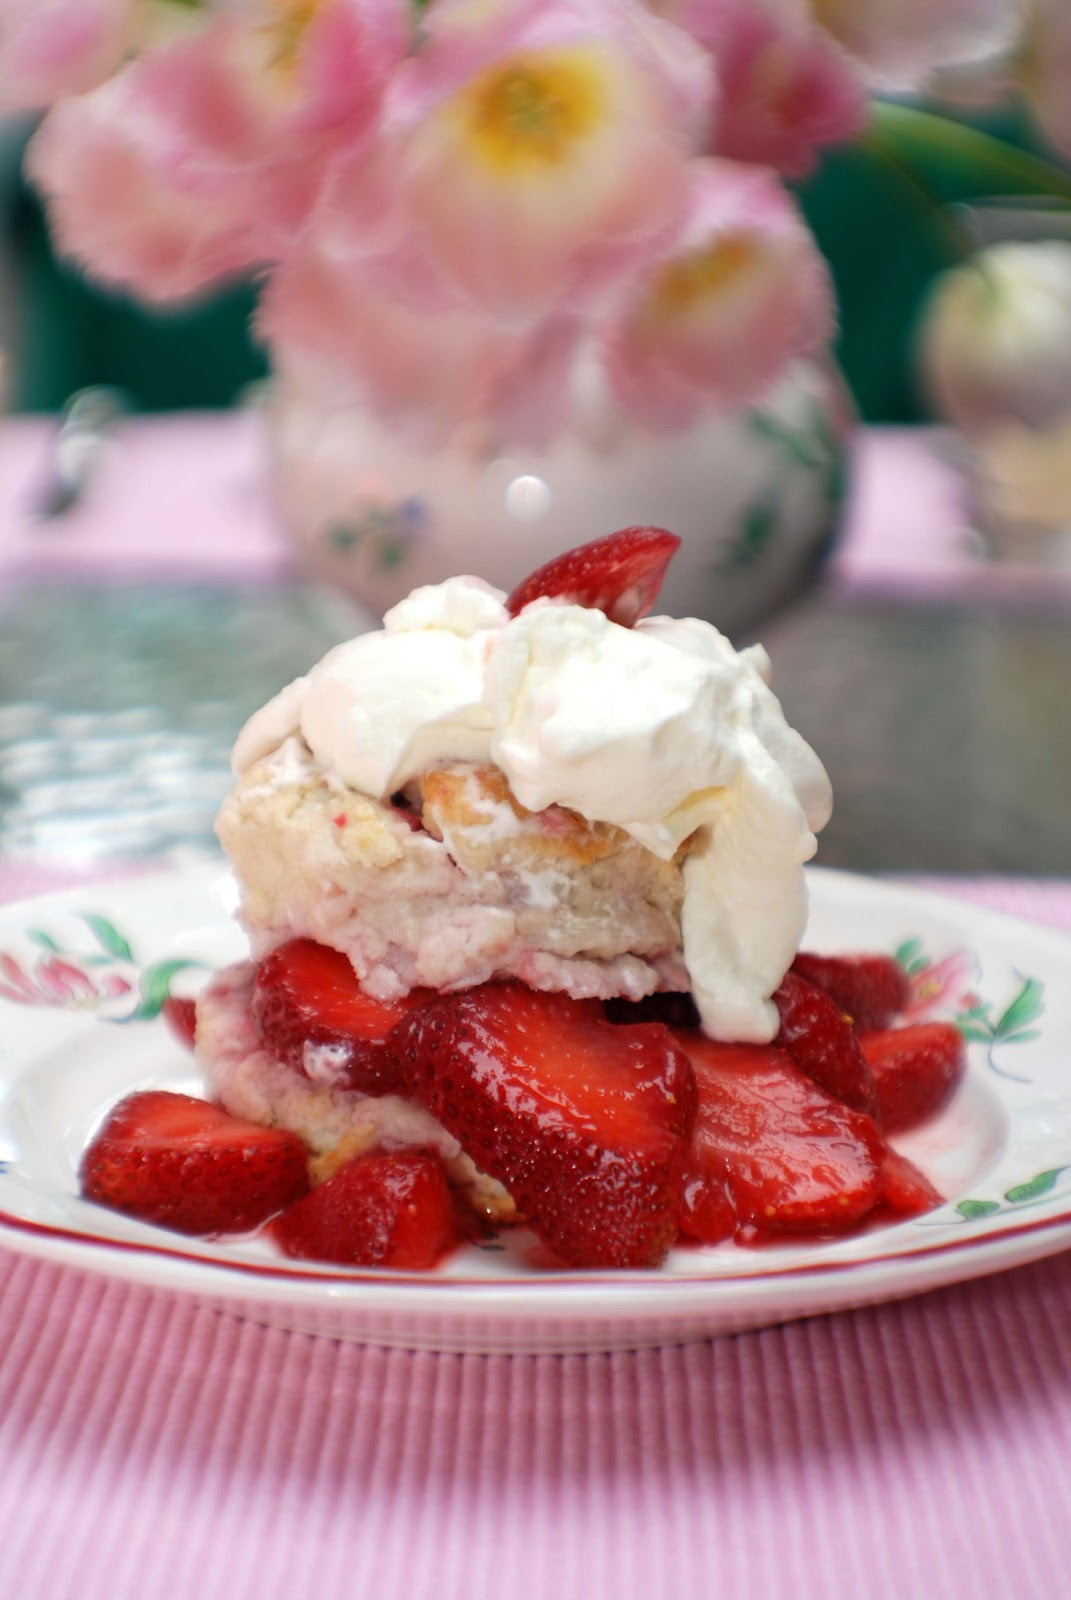 Strawberry And Banana Shortcake Biscuits Recipe — Dishmaps